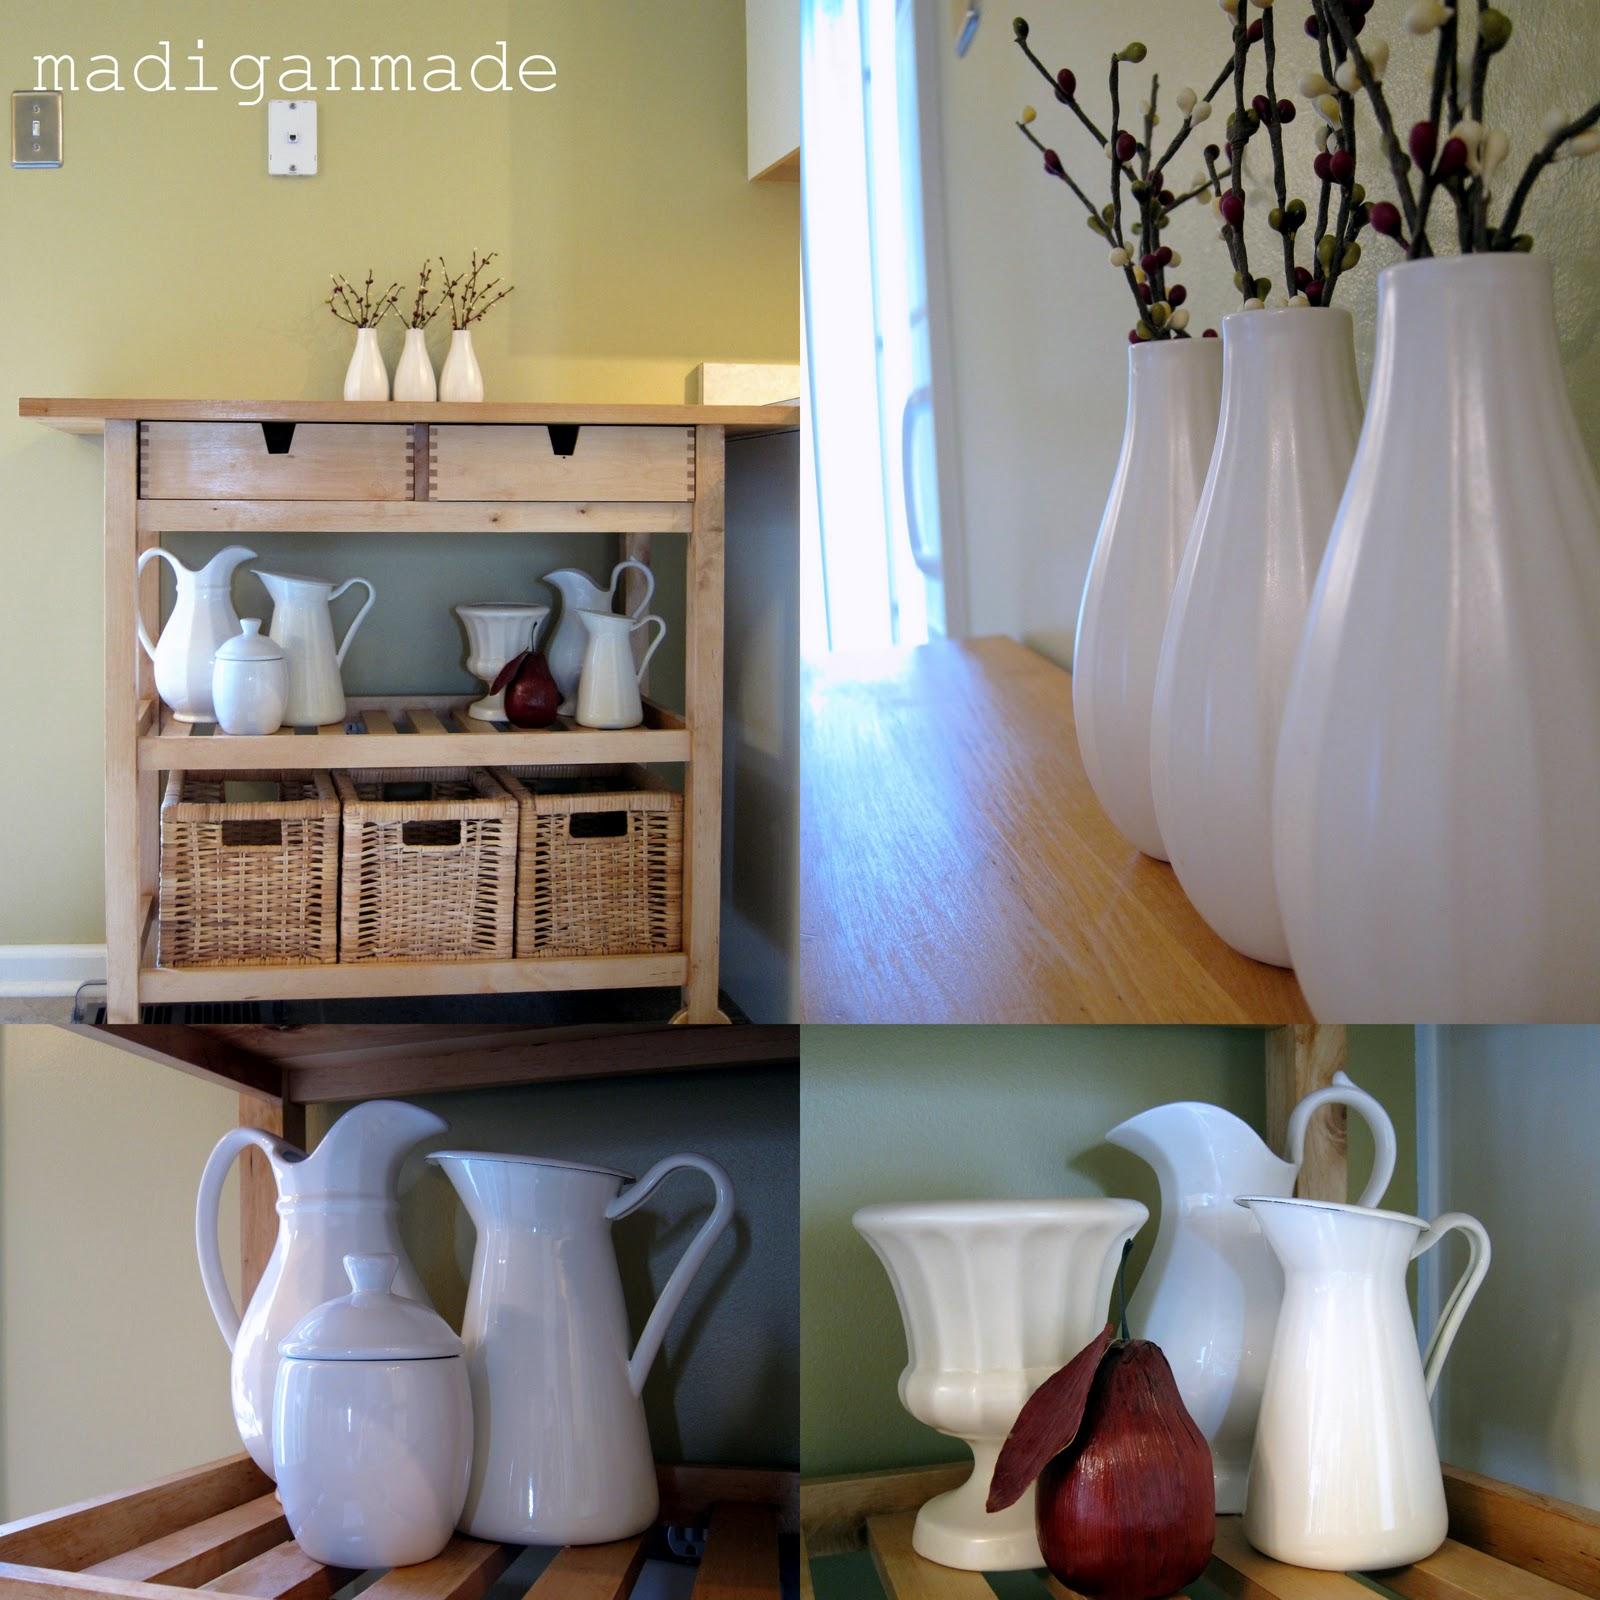 https://i1.wp.com/4.bp.blogspot.com/_xd5aEjCcjL4/TSCerHj51mI/AAAAAAAABVY/1UmOjYhWb7w/s1600/pottery.jpg?resize=533%2C533